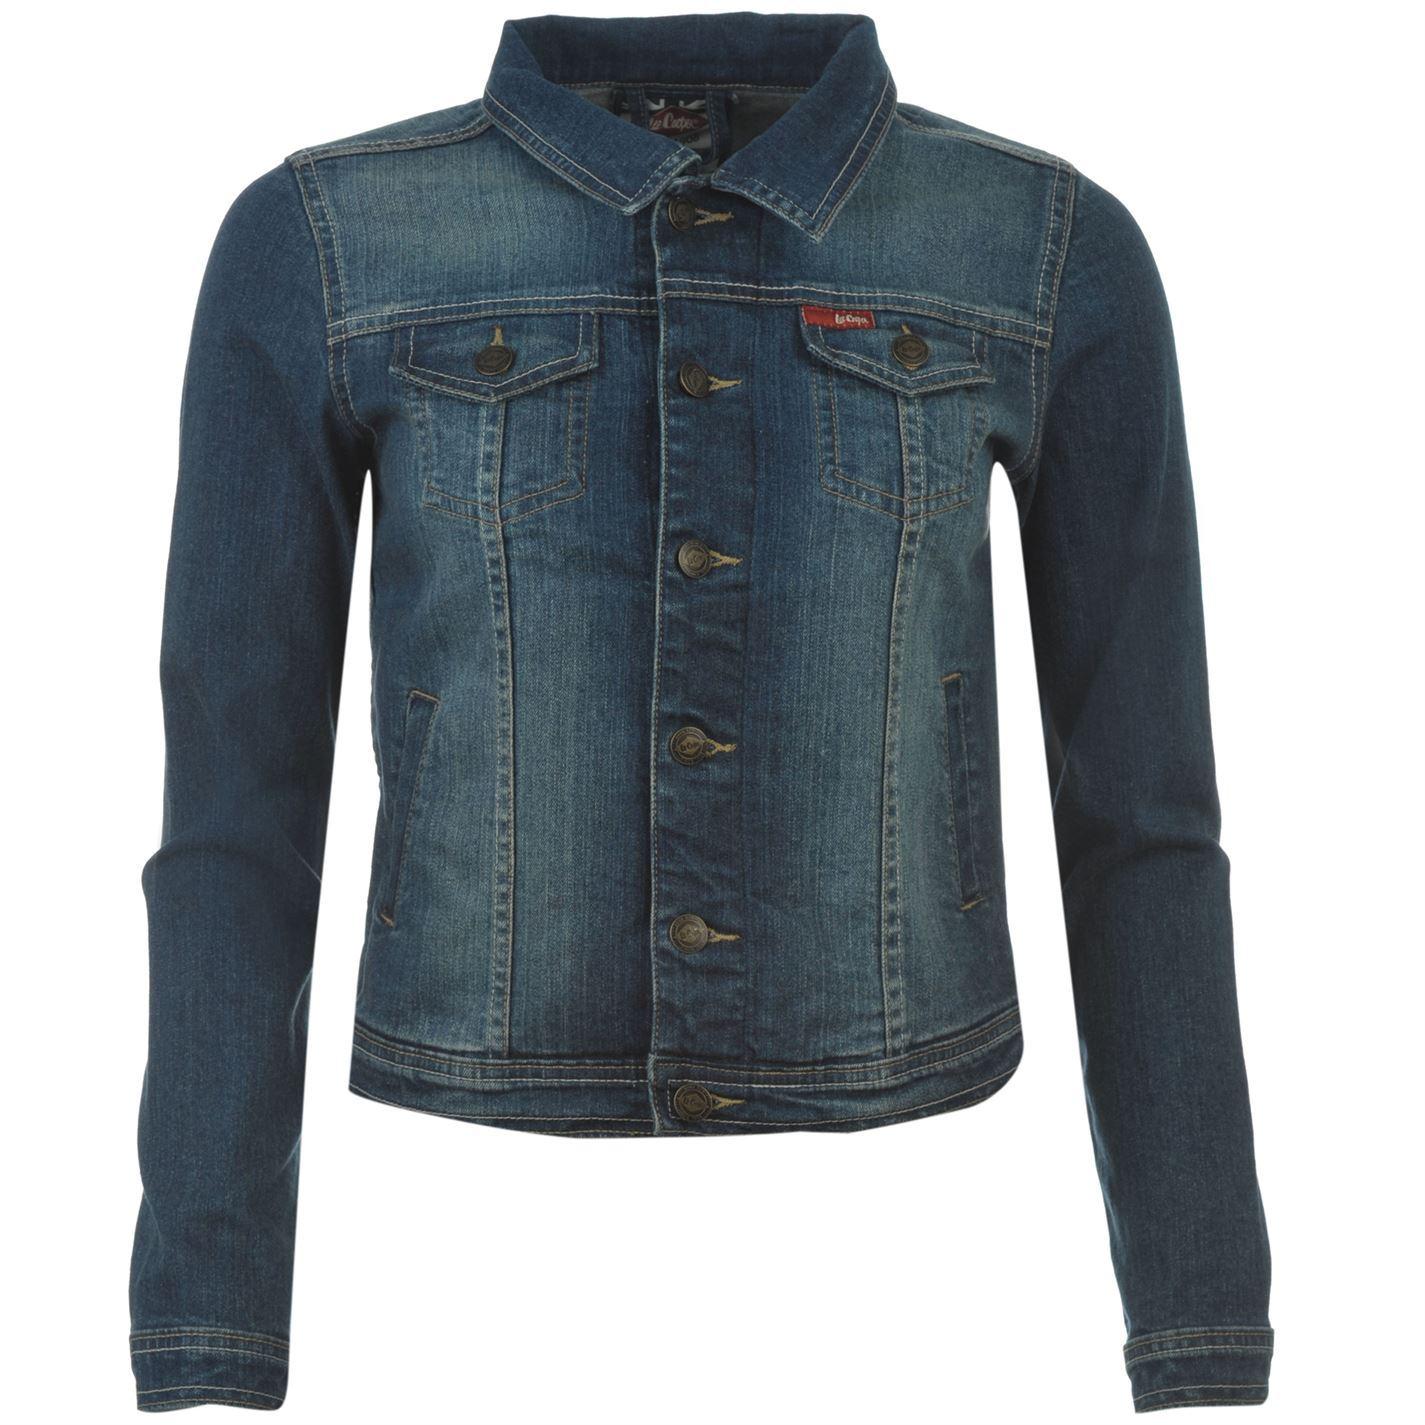 Lee Cooper Womens C Denim Jacket Ladies Long Sleeve Button Up Casual | eBay